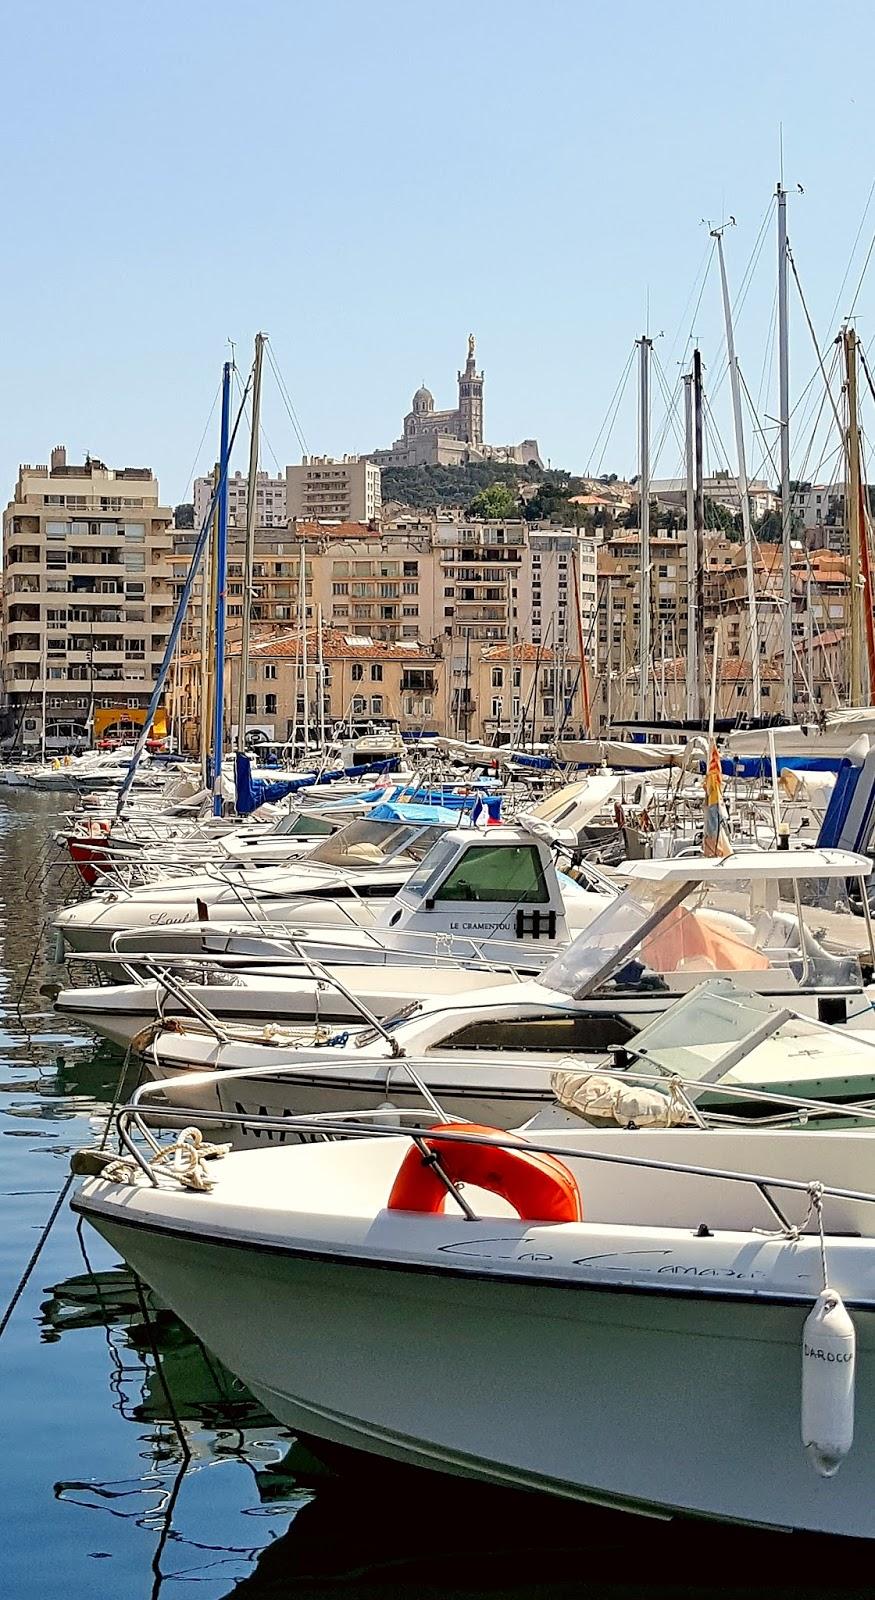 Our house in provence a trip to marseille for an authentic bouillabaisse - Restaurant bouillabaisse marseille vieux port ...